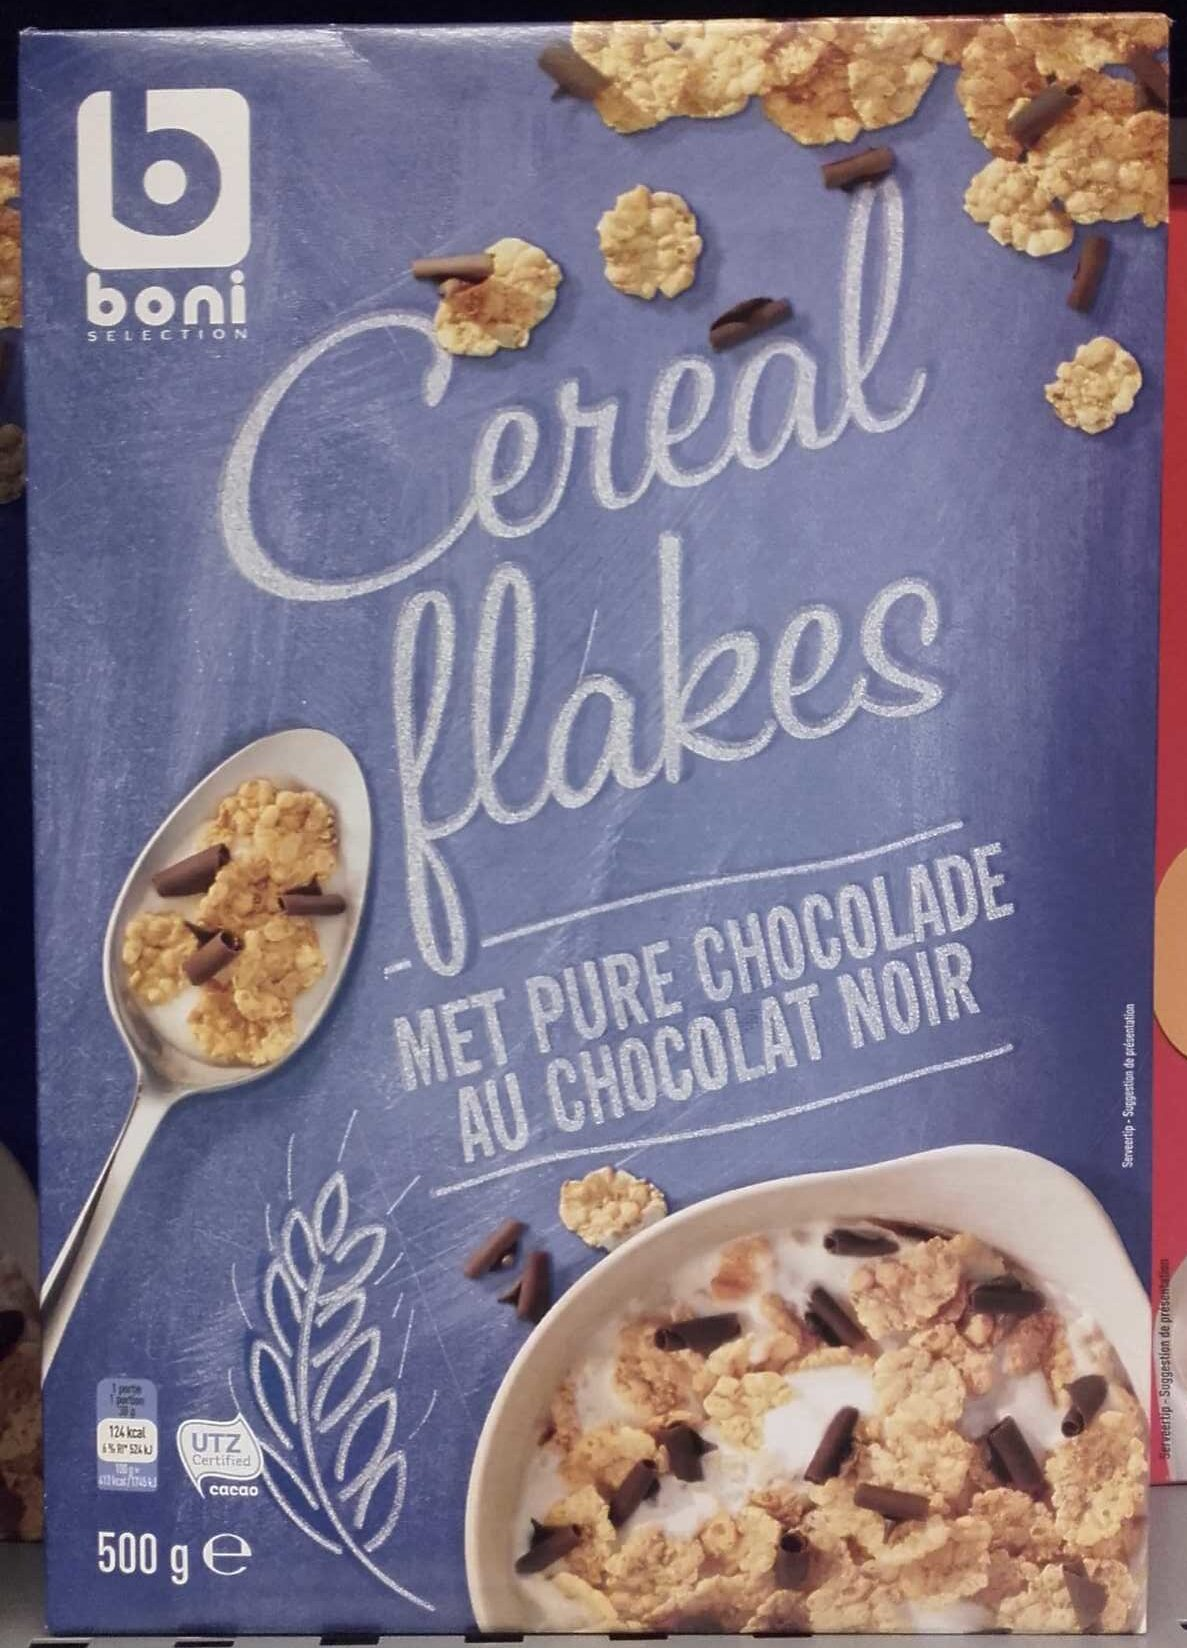 Cereal Flakes au chocolat noir - Product - fr